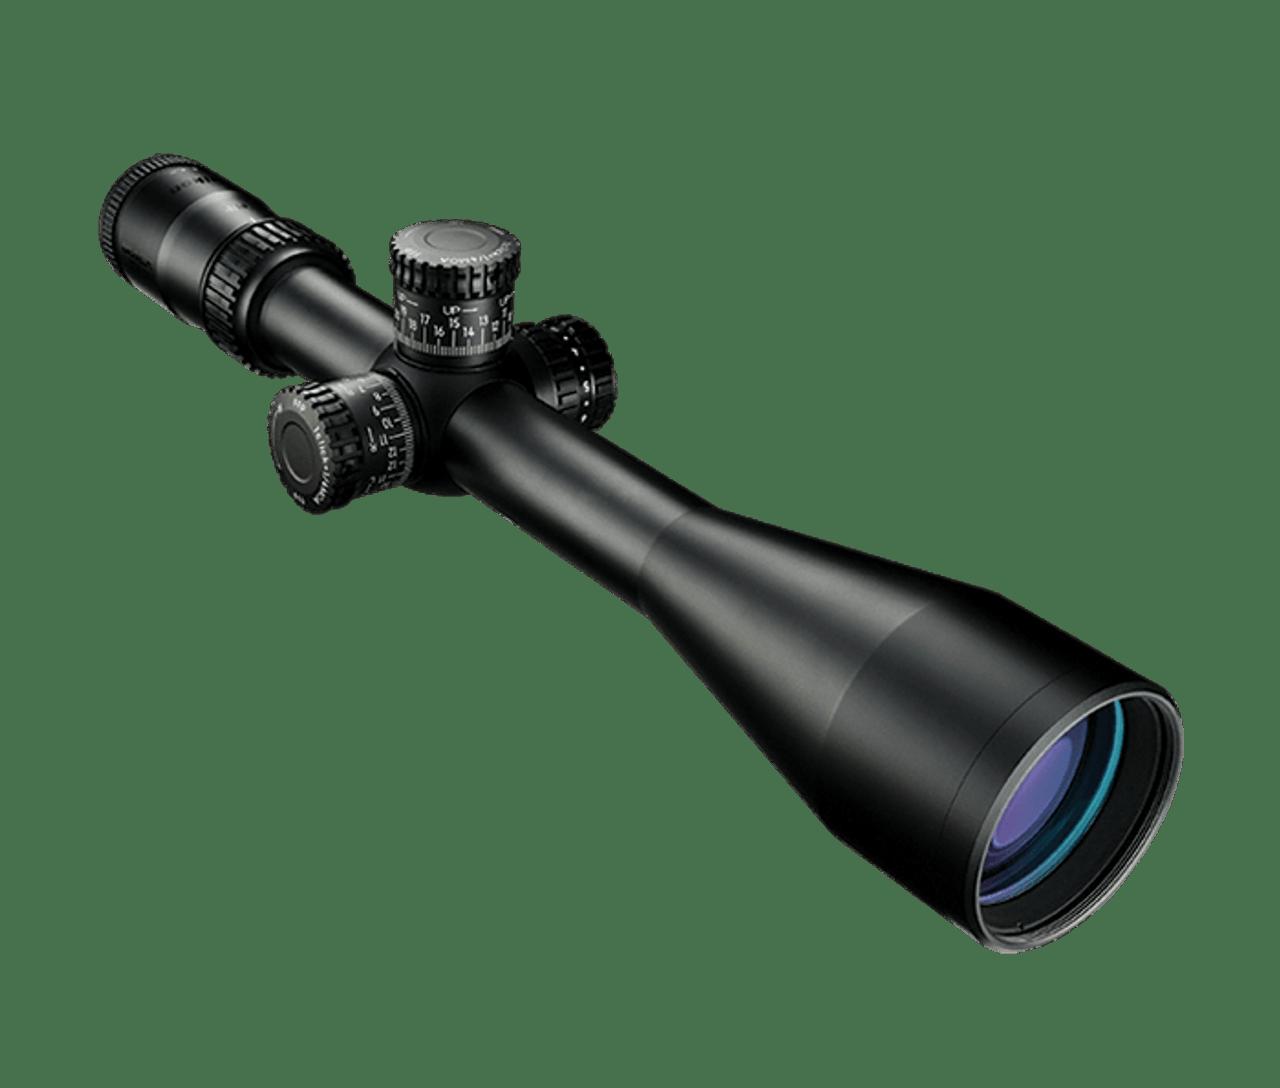 Nikon BLACK FX1000 4-16x50SF Illuminated FX-MRAD